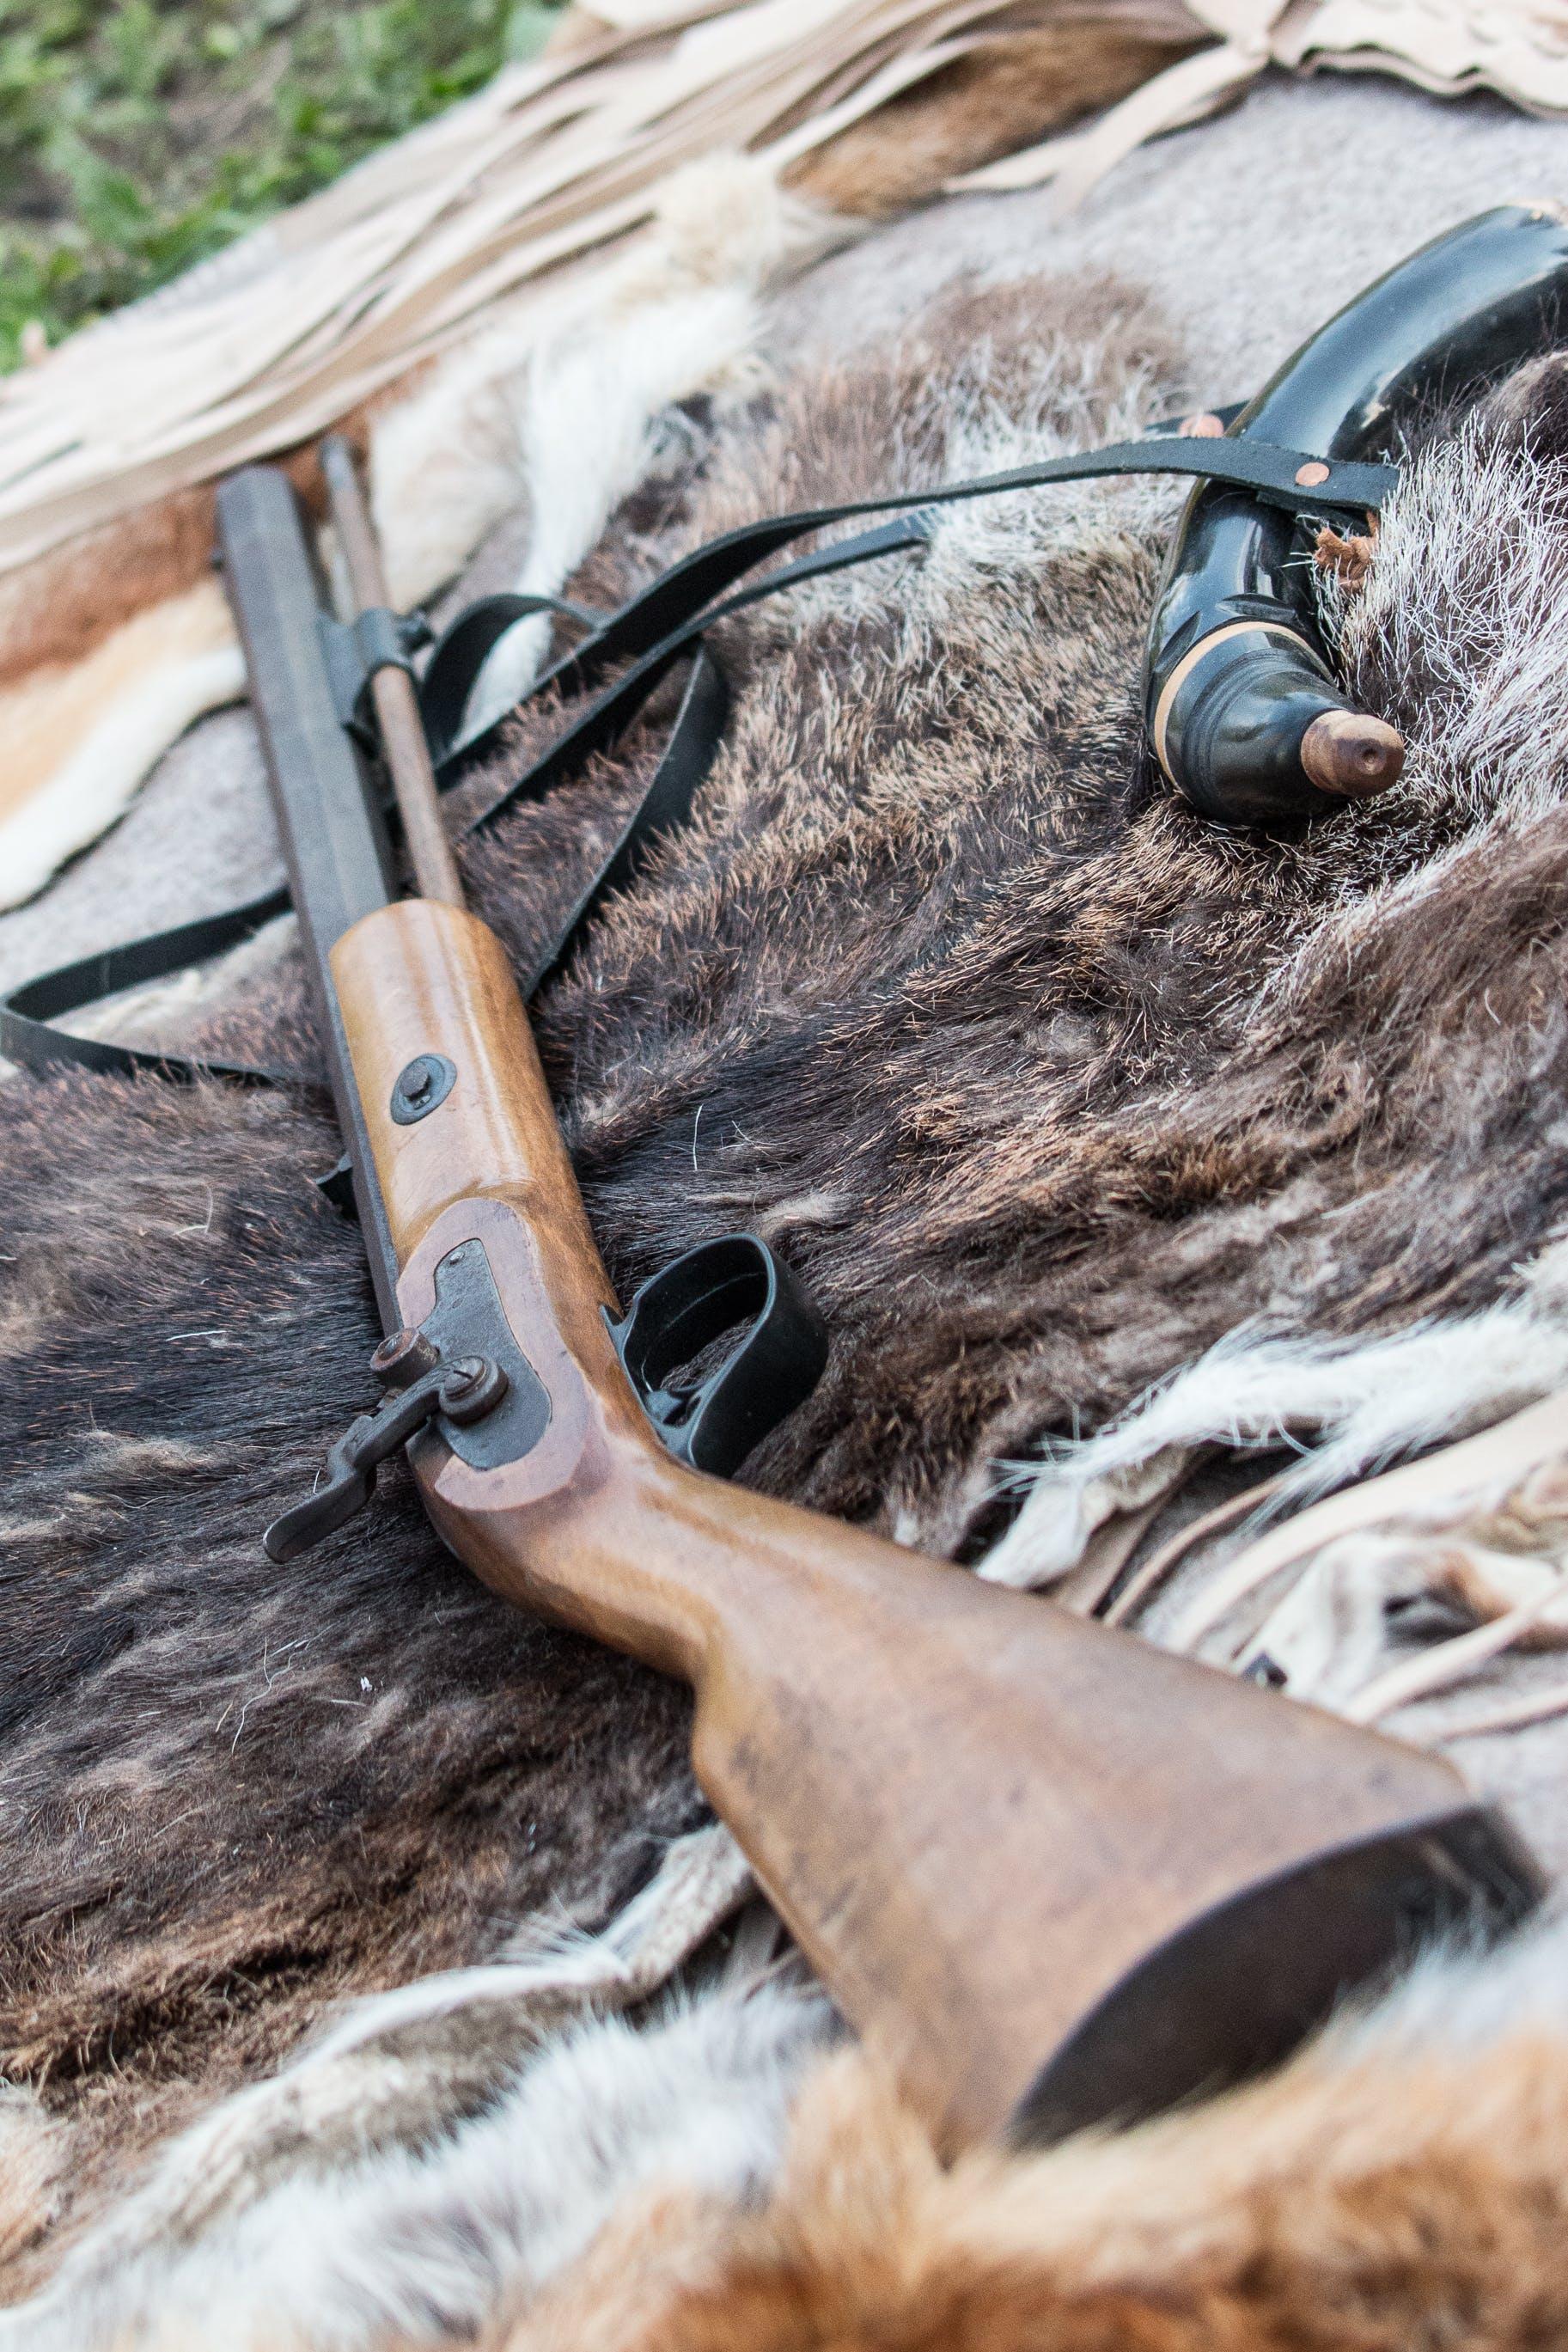 Free stock photo of percussion rifle, rifle